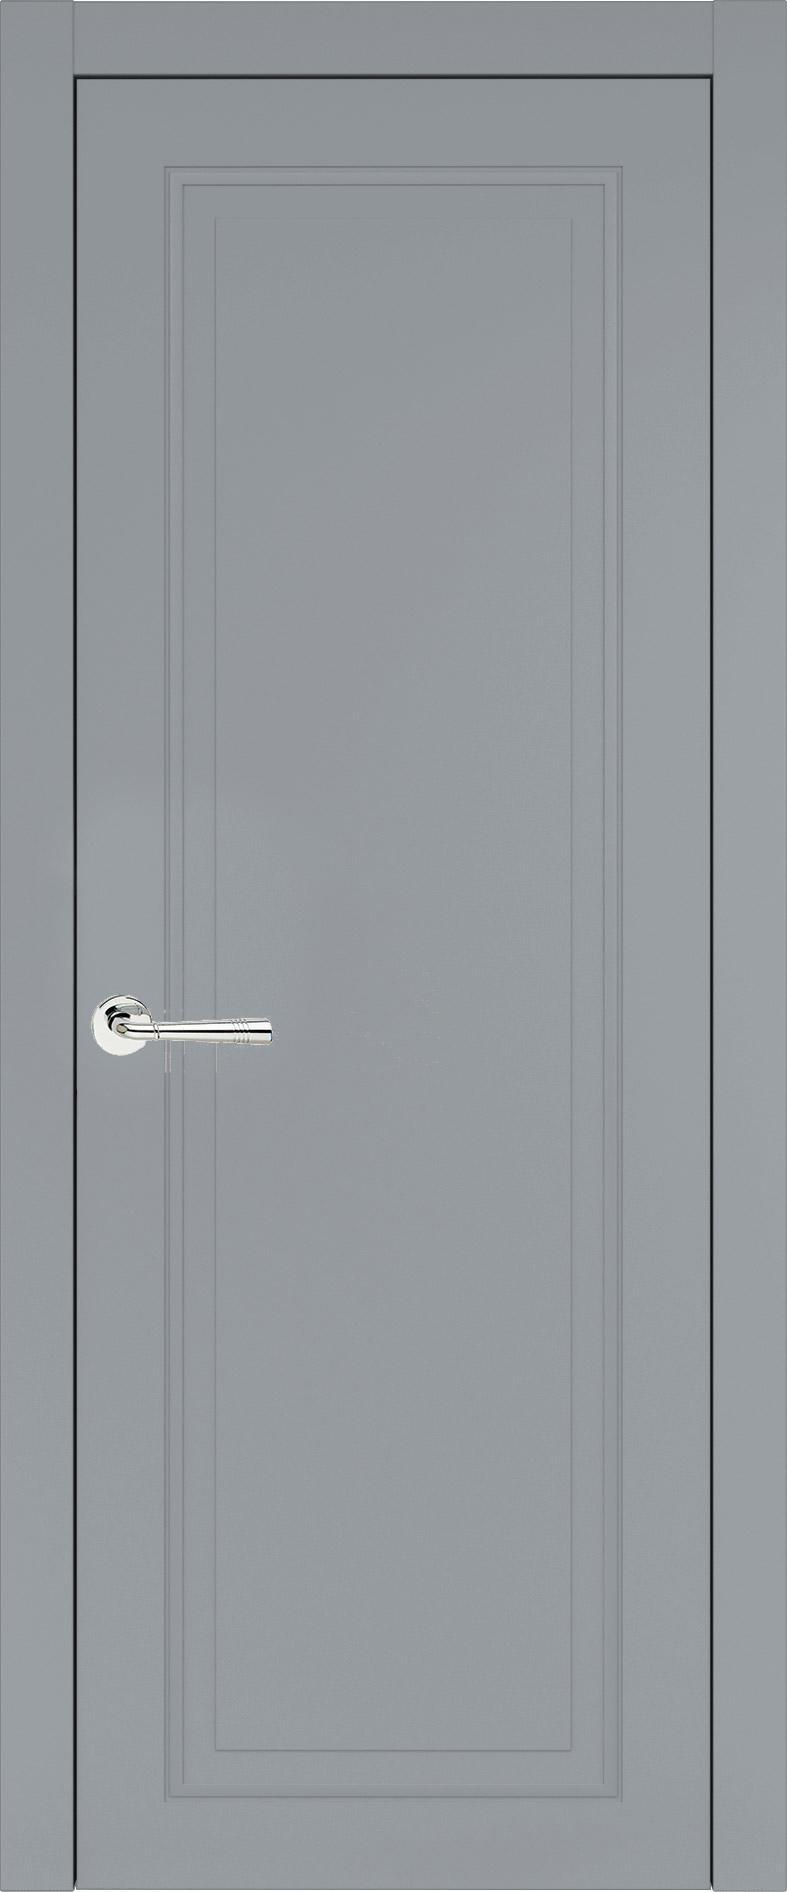 Domenica Neo Classic цвет - Серебристо-серая эмаль (RAL 7045) Без стекла (ДГ)